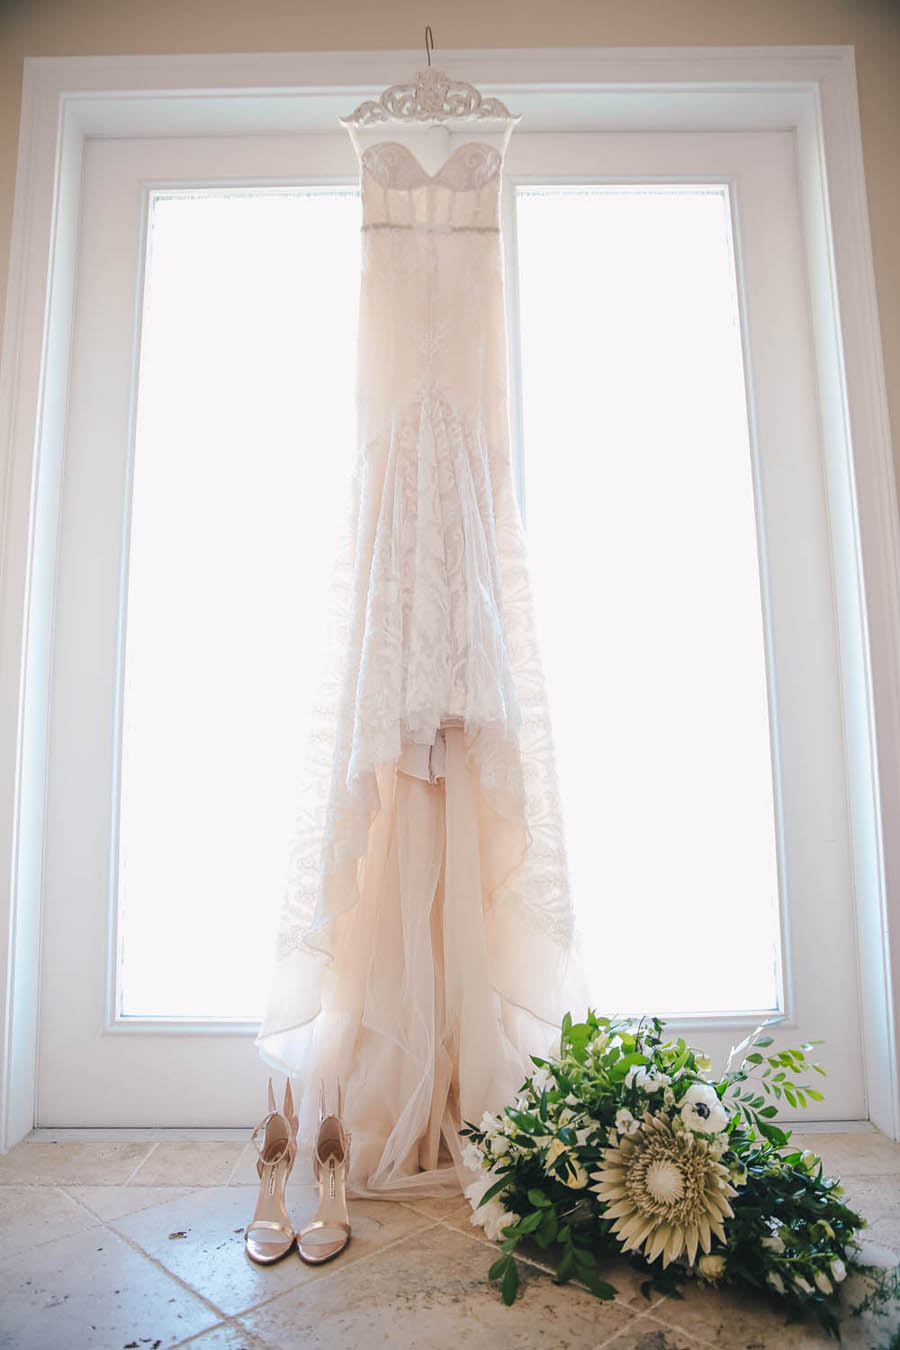 Inbal Dror Mermaid Wedding Dress on Hanger